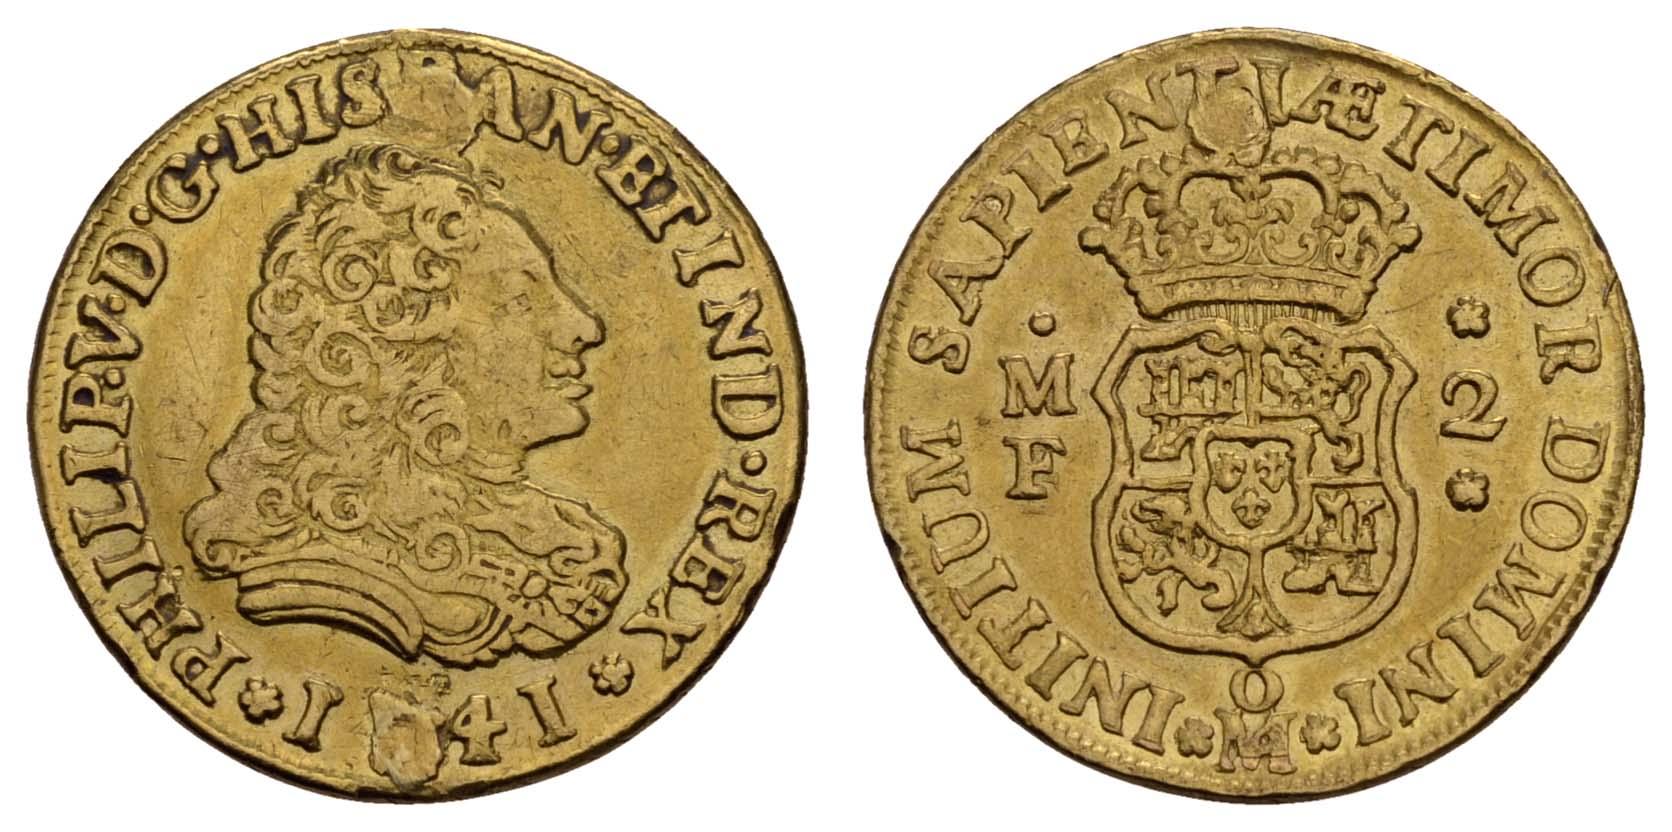 Lot 2064 - übersee mexiko -  Auktionshaus Ulrich Felzmann GmbH & Co. KG Coins single lots